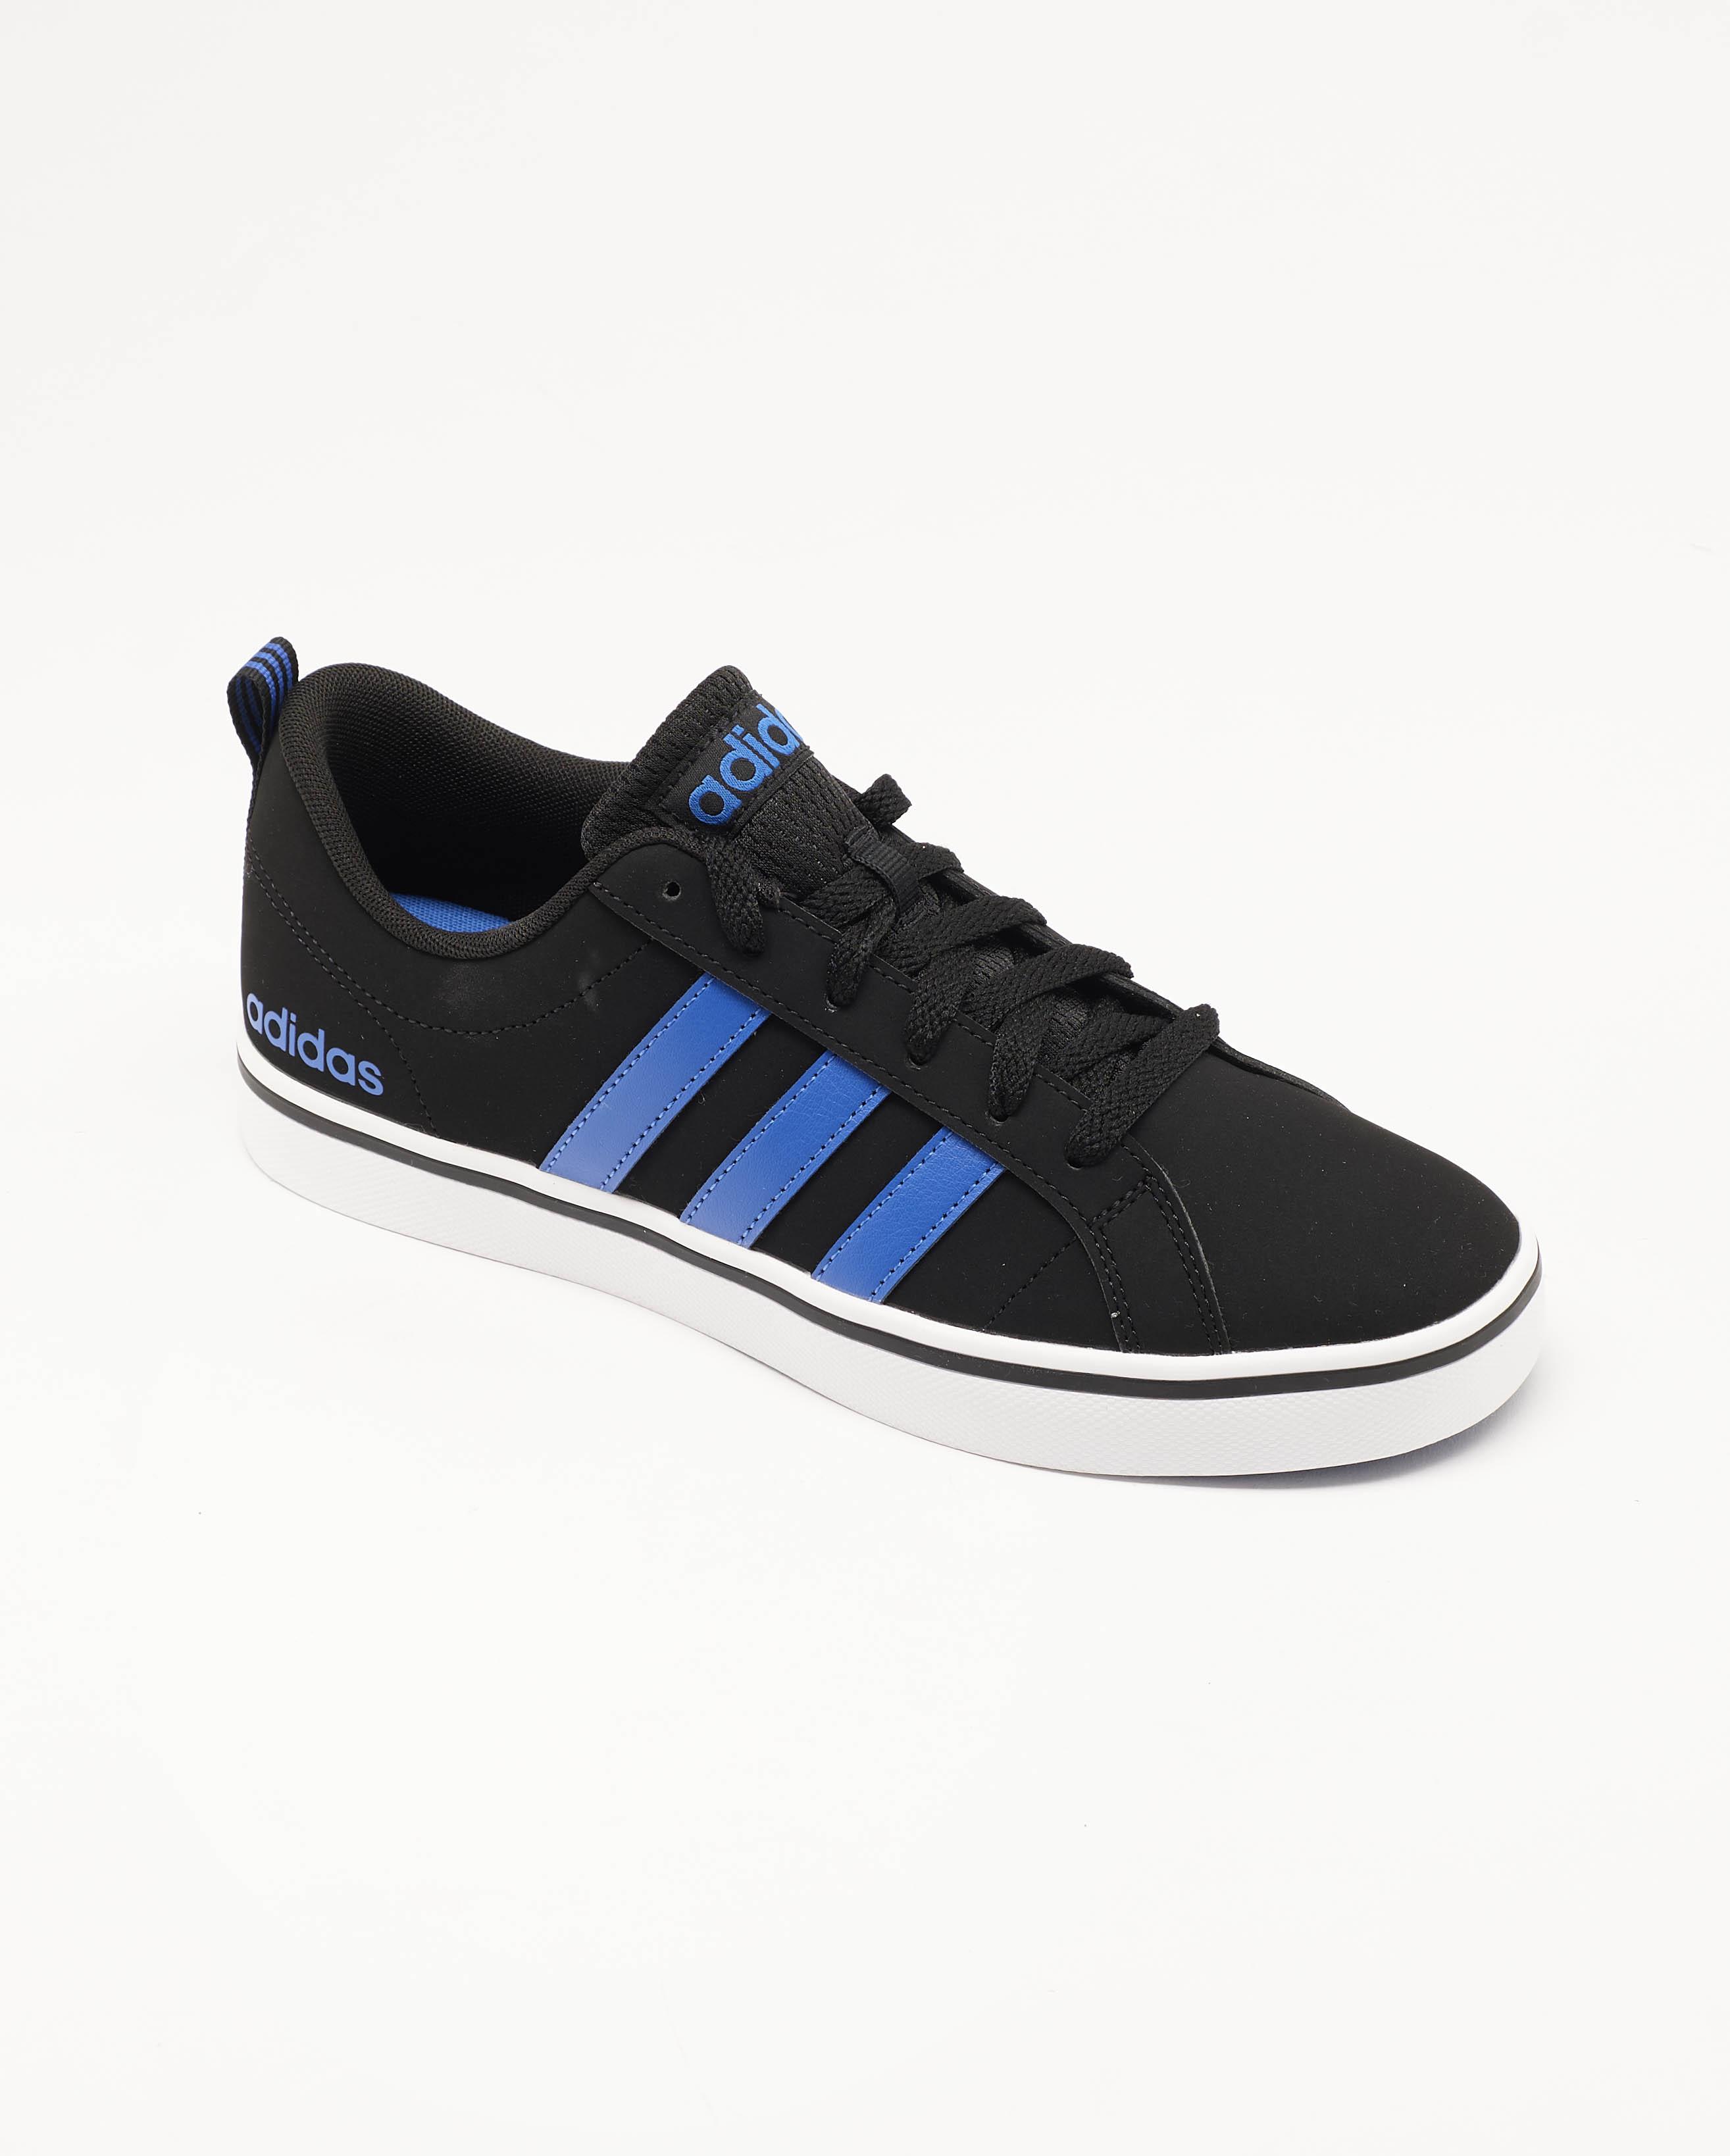 Baskets Homme - Skate Bleu Adidas - Aw4591